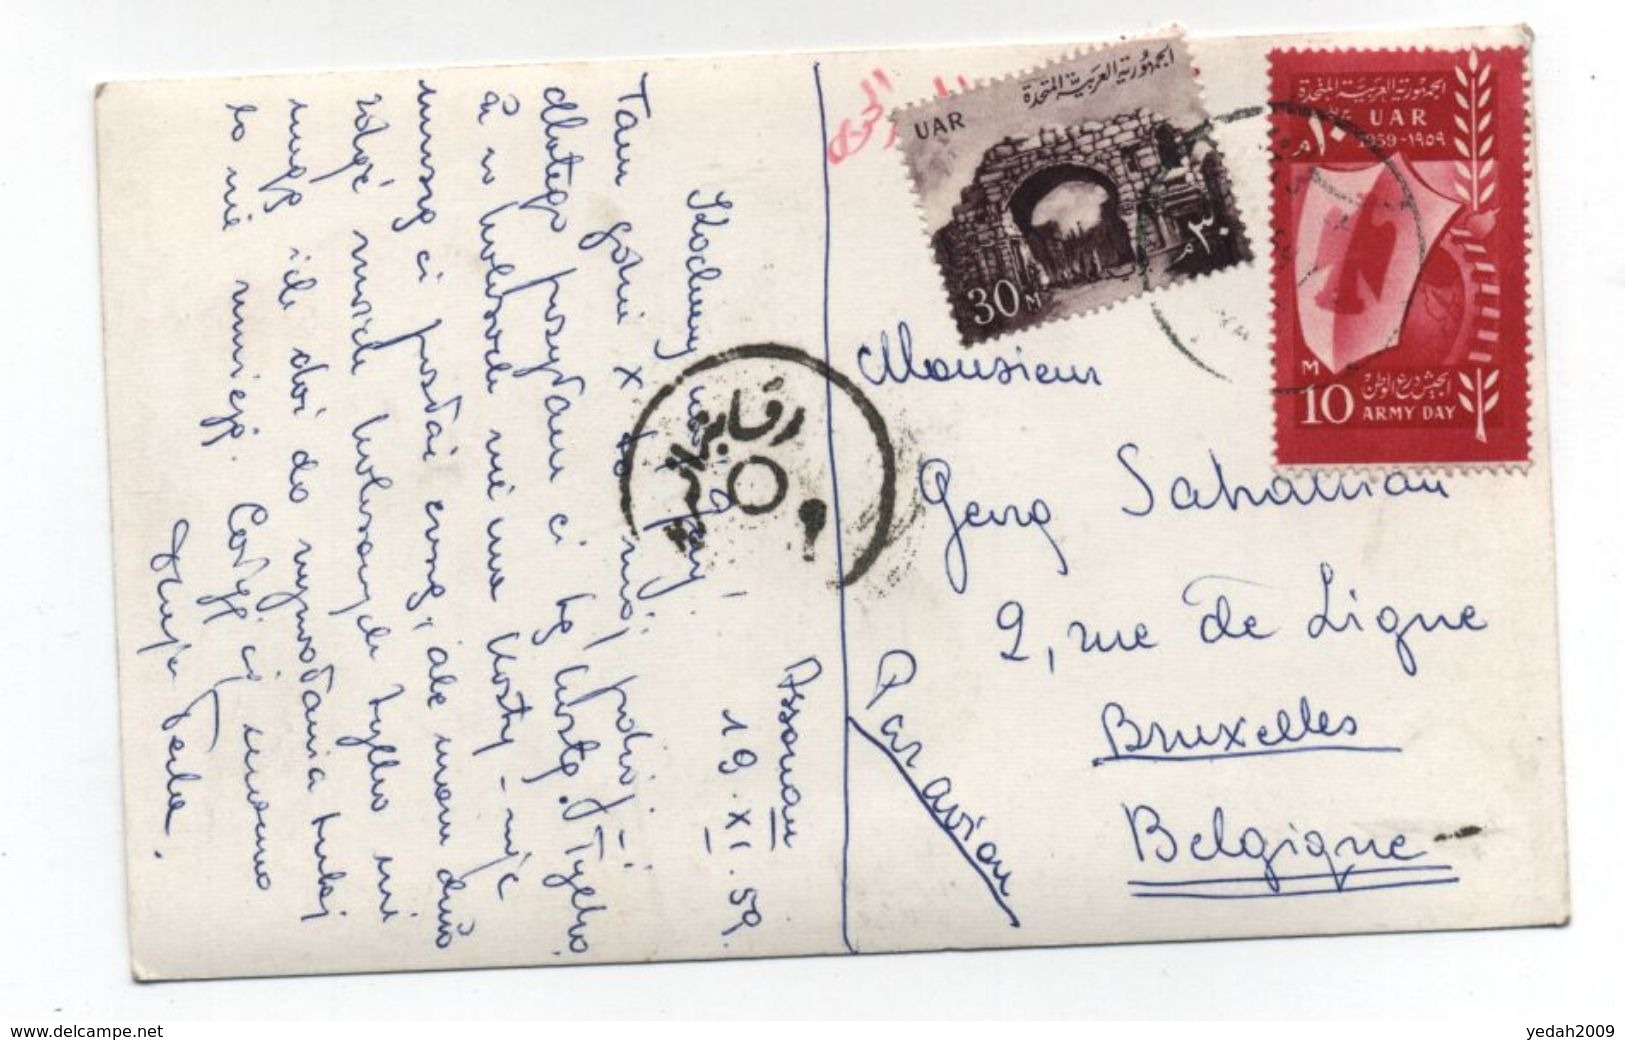 UAR CENSORED AIRMAIL POSTCARD TO Belgium 1959 CATARACT HOTEL ASSUAN - Poste Aérienne